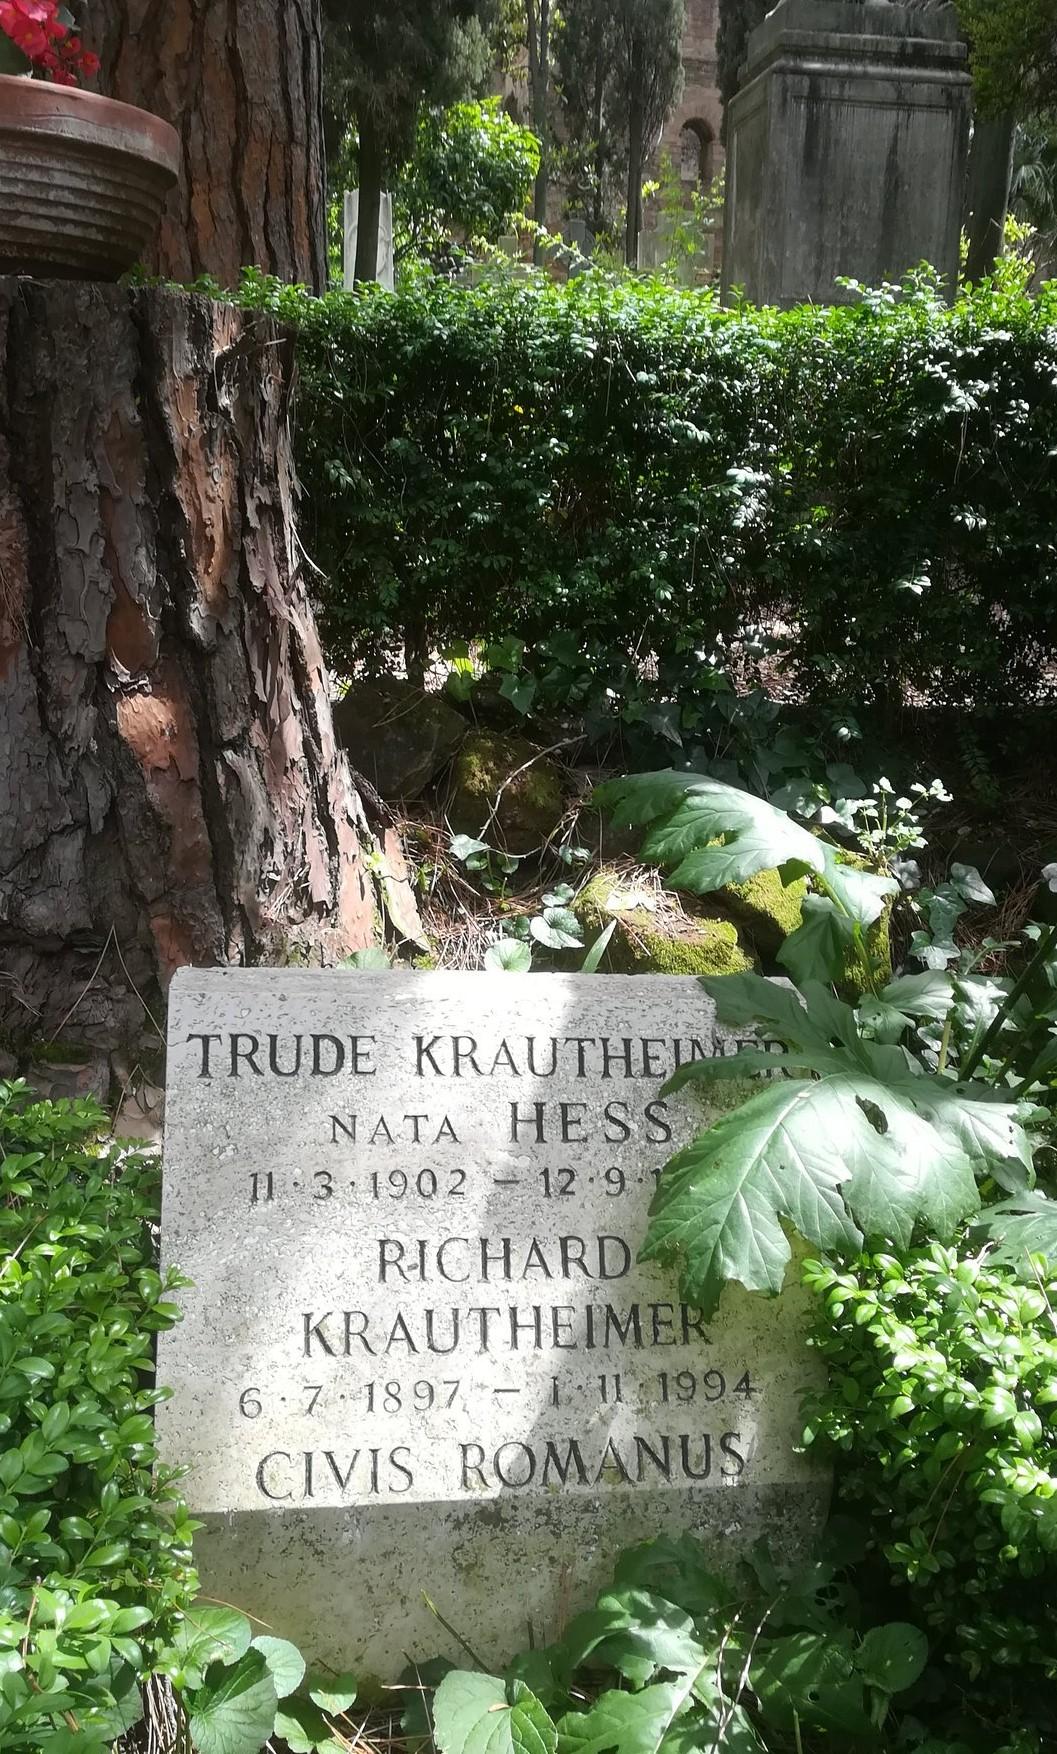 Krautheimerien hauta